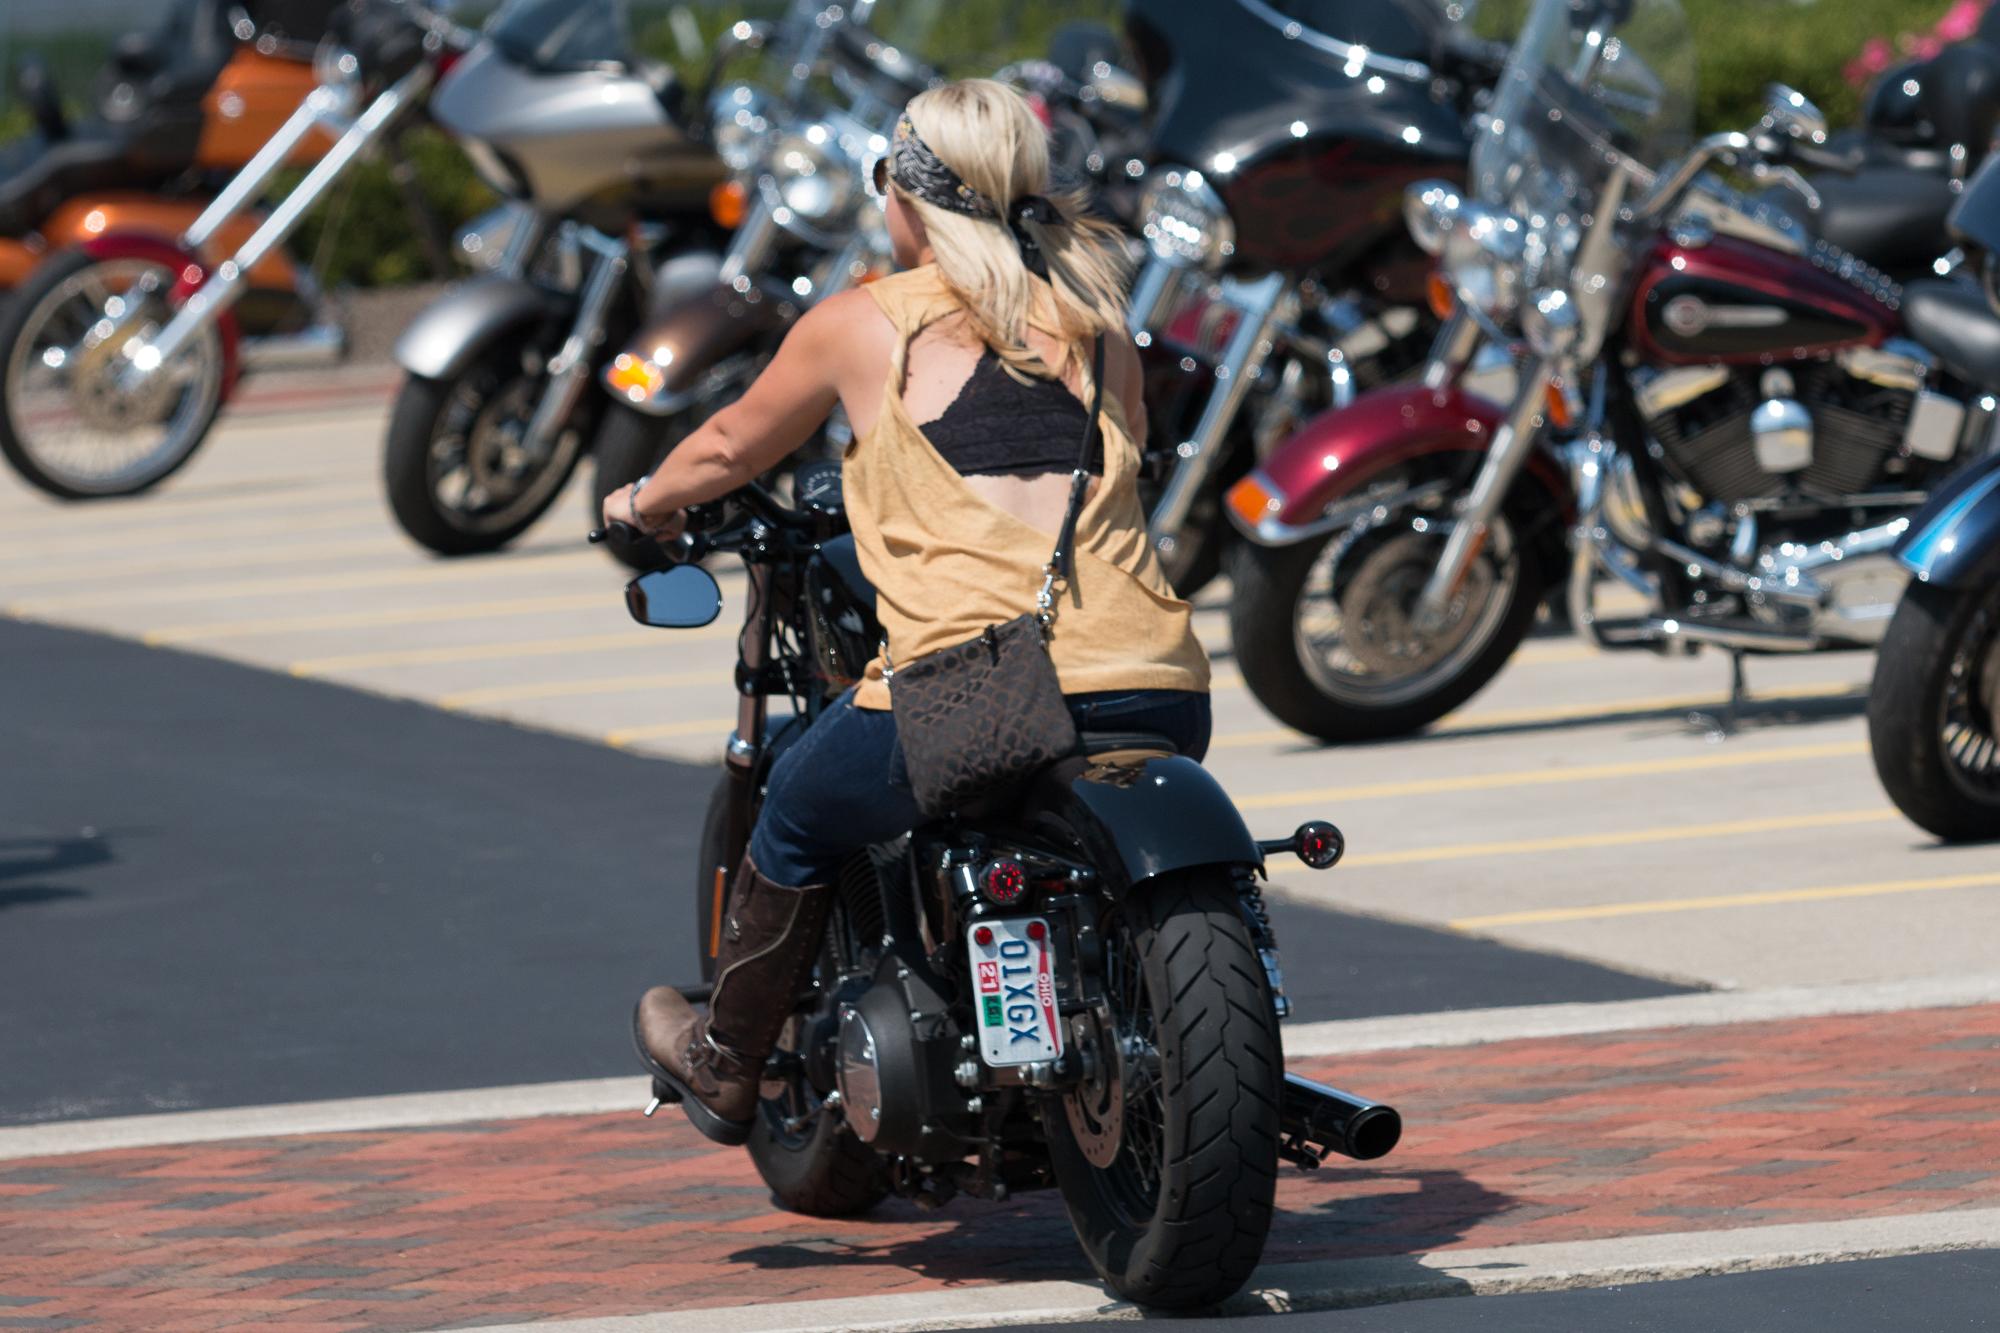 027_bikes.jpg